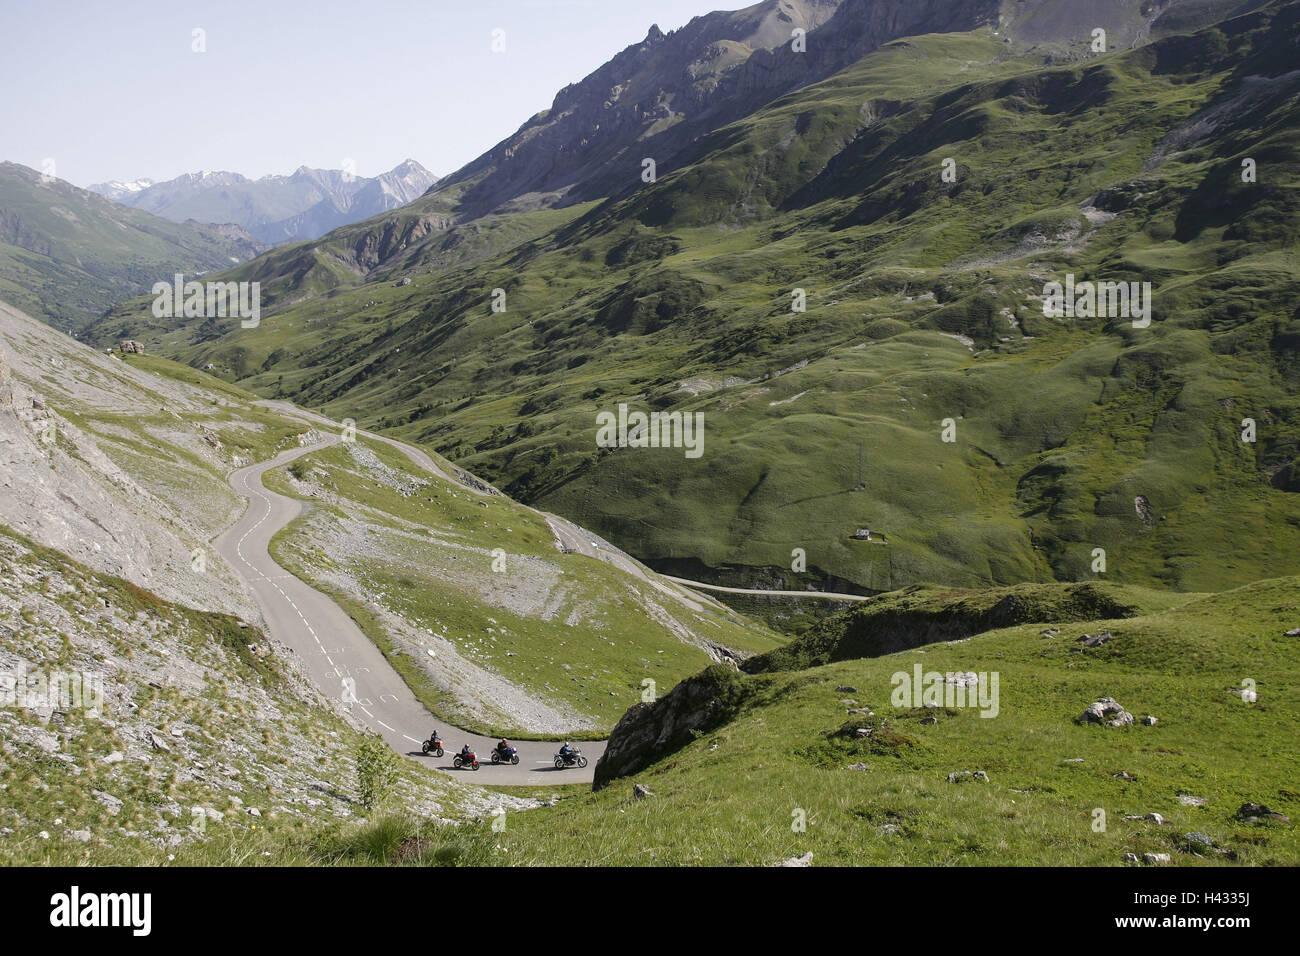 Motorcycles, alp scenery - Stock Image